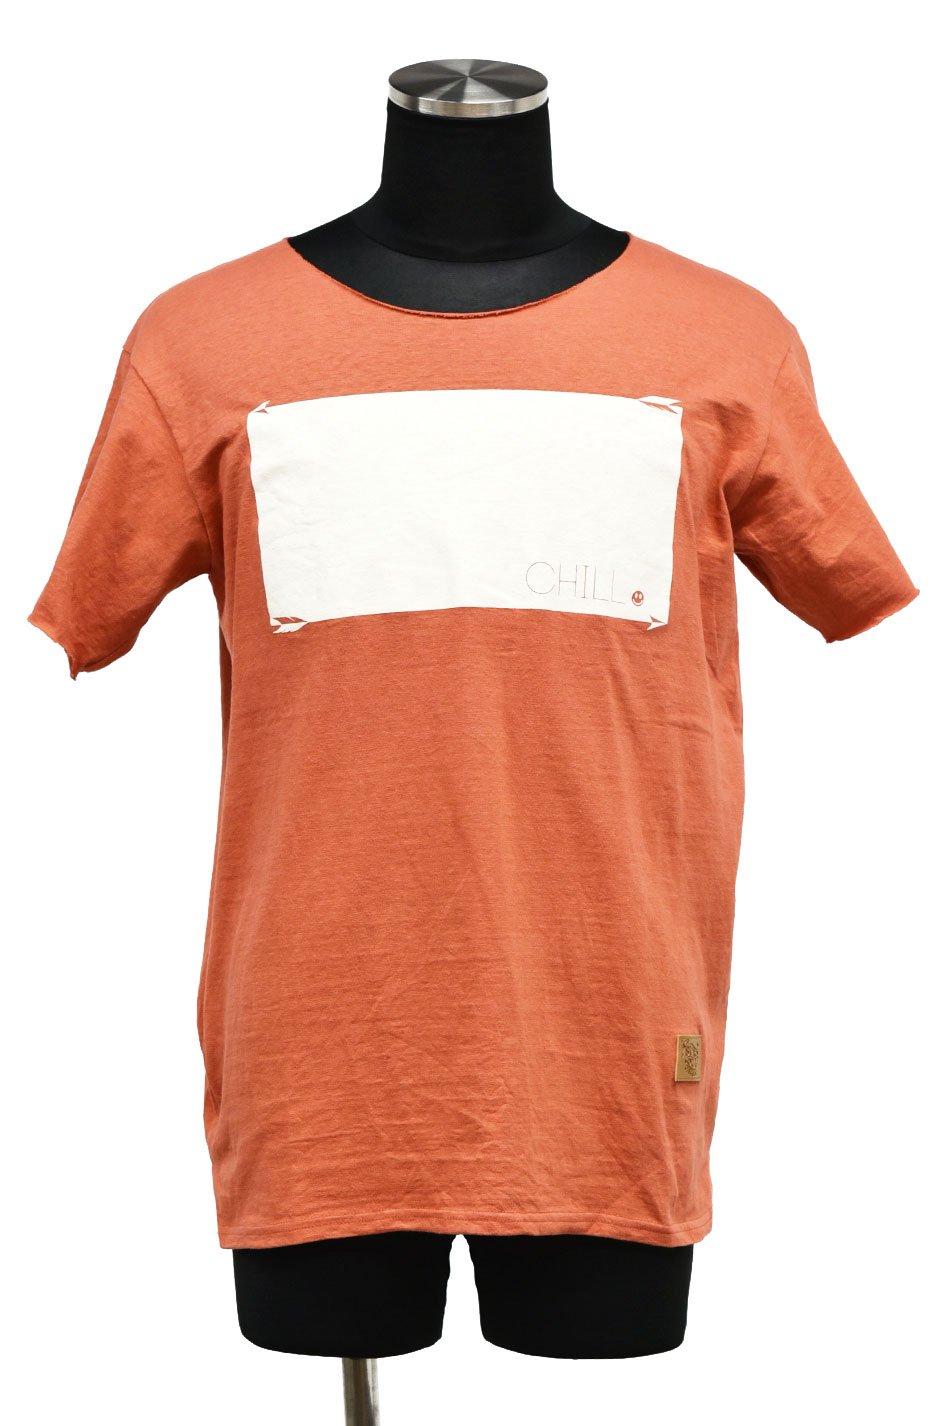 5%off! BURNOUT(バーンアウト )『CHILL』ラフィー天竺 カットオフTシャツ / ブロンズレッド